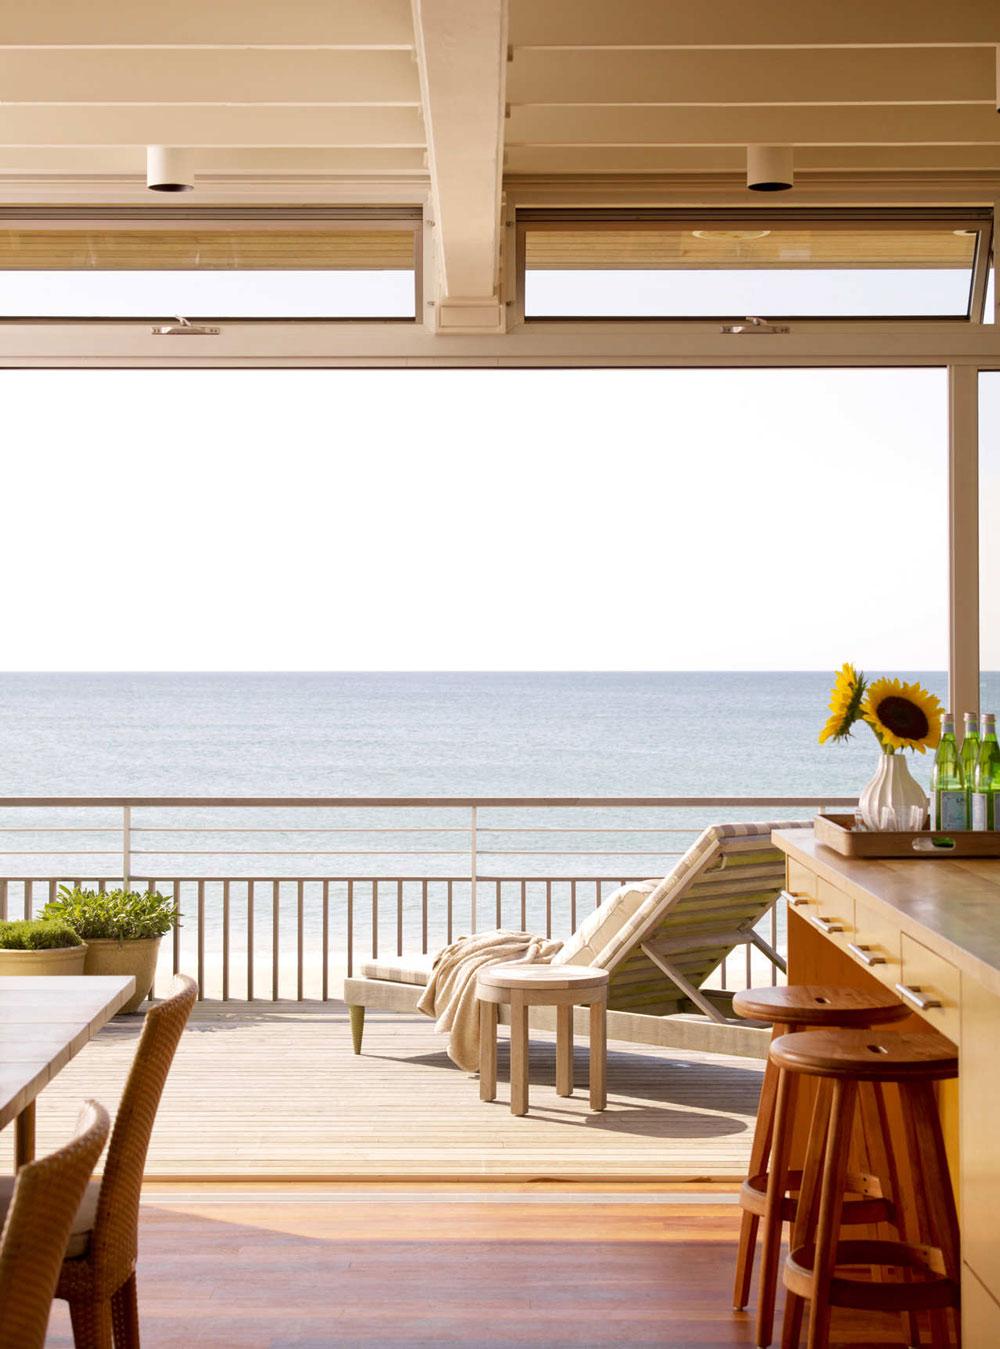 Balcony, Ocean Views, Surfside House in Bridgehampton, New York by Stelle Architects